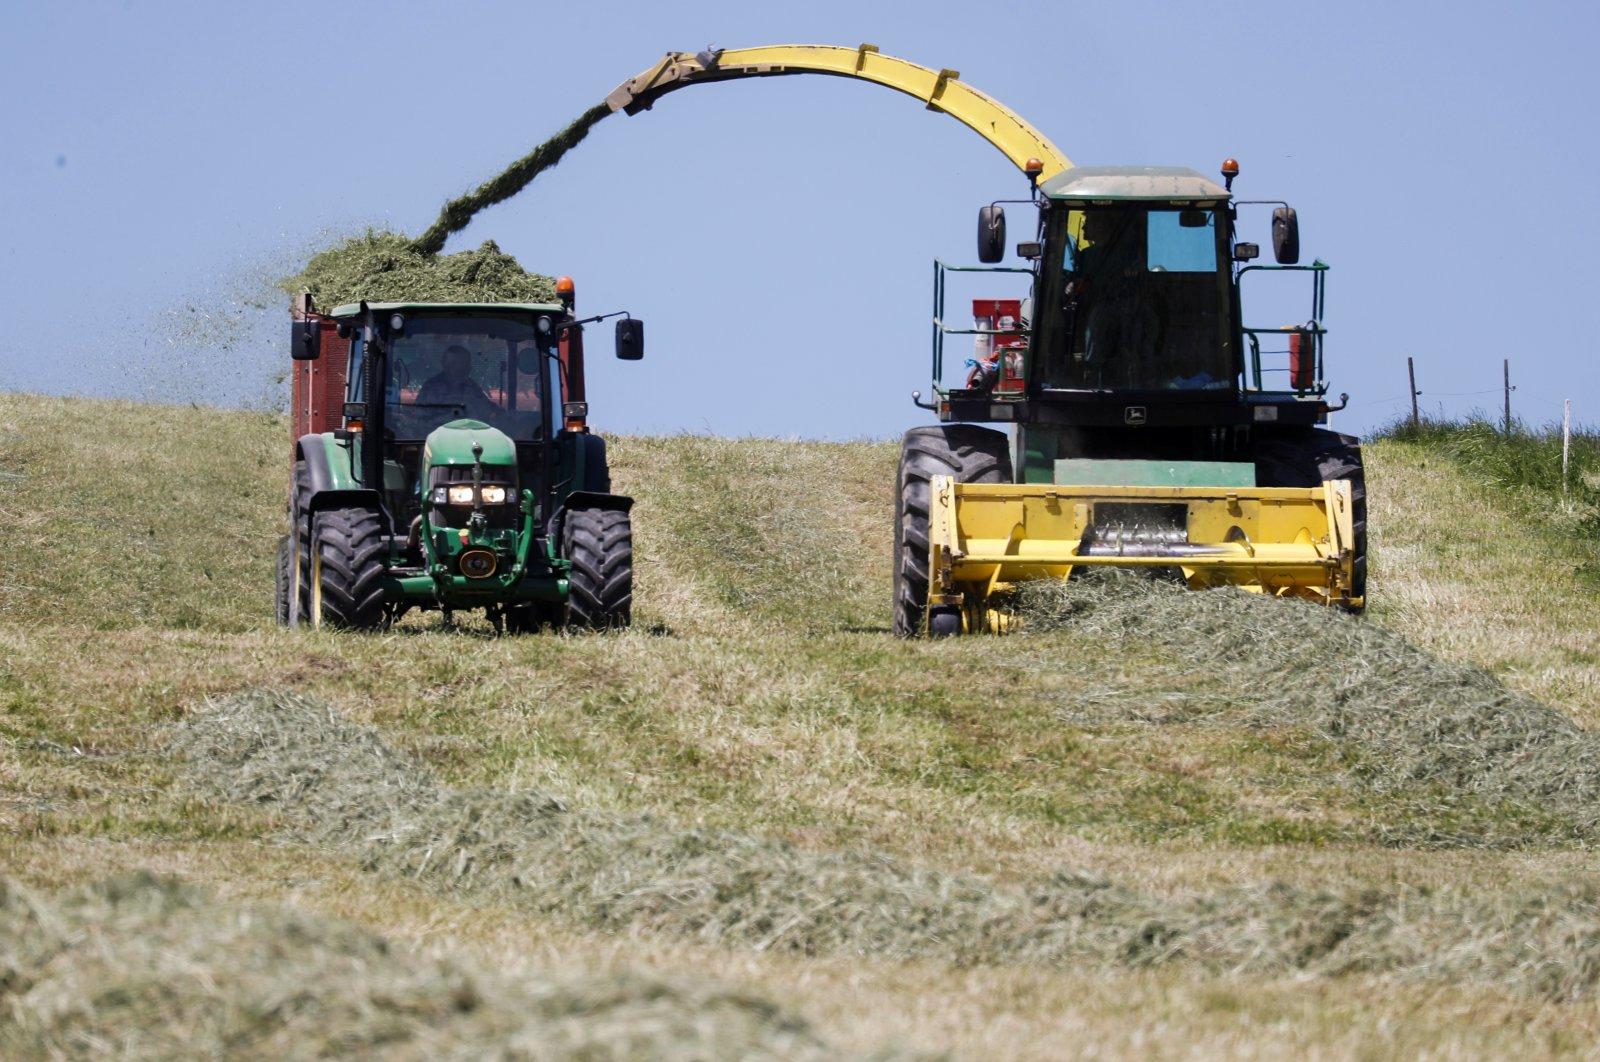 A farmer uses a machine to load cut hay on a trailer near Birmensdorf, Switzerland, June 1, 2021 (Reuters Photo)